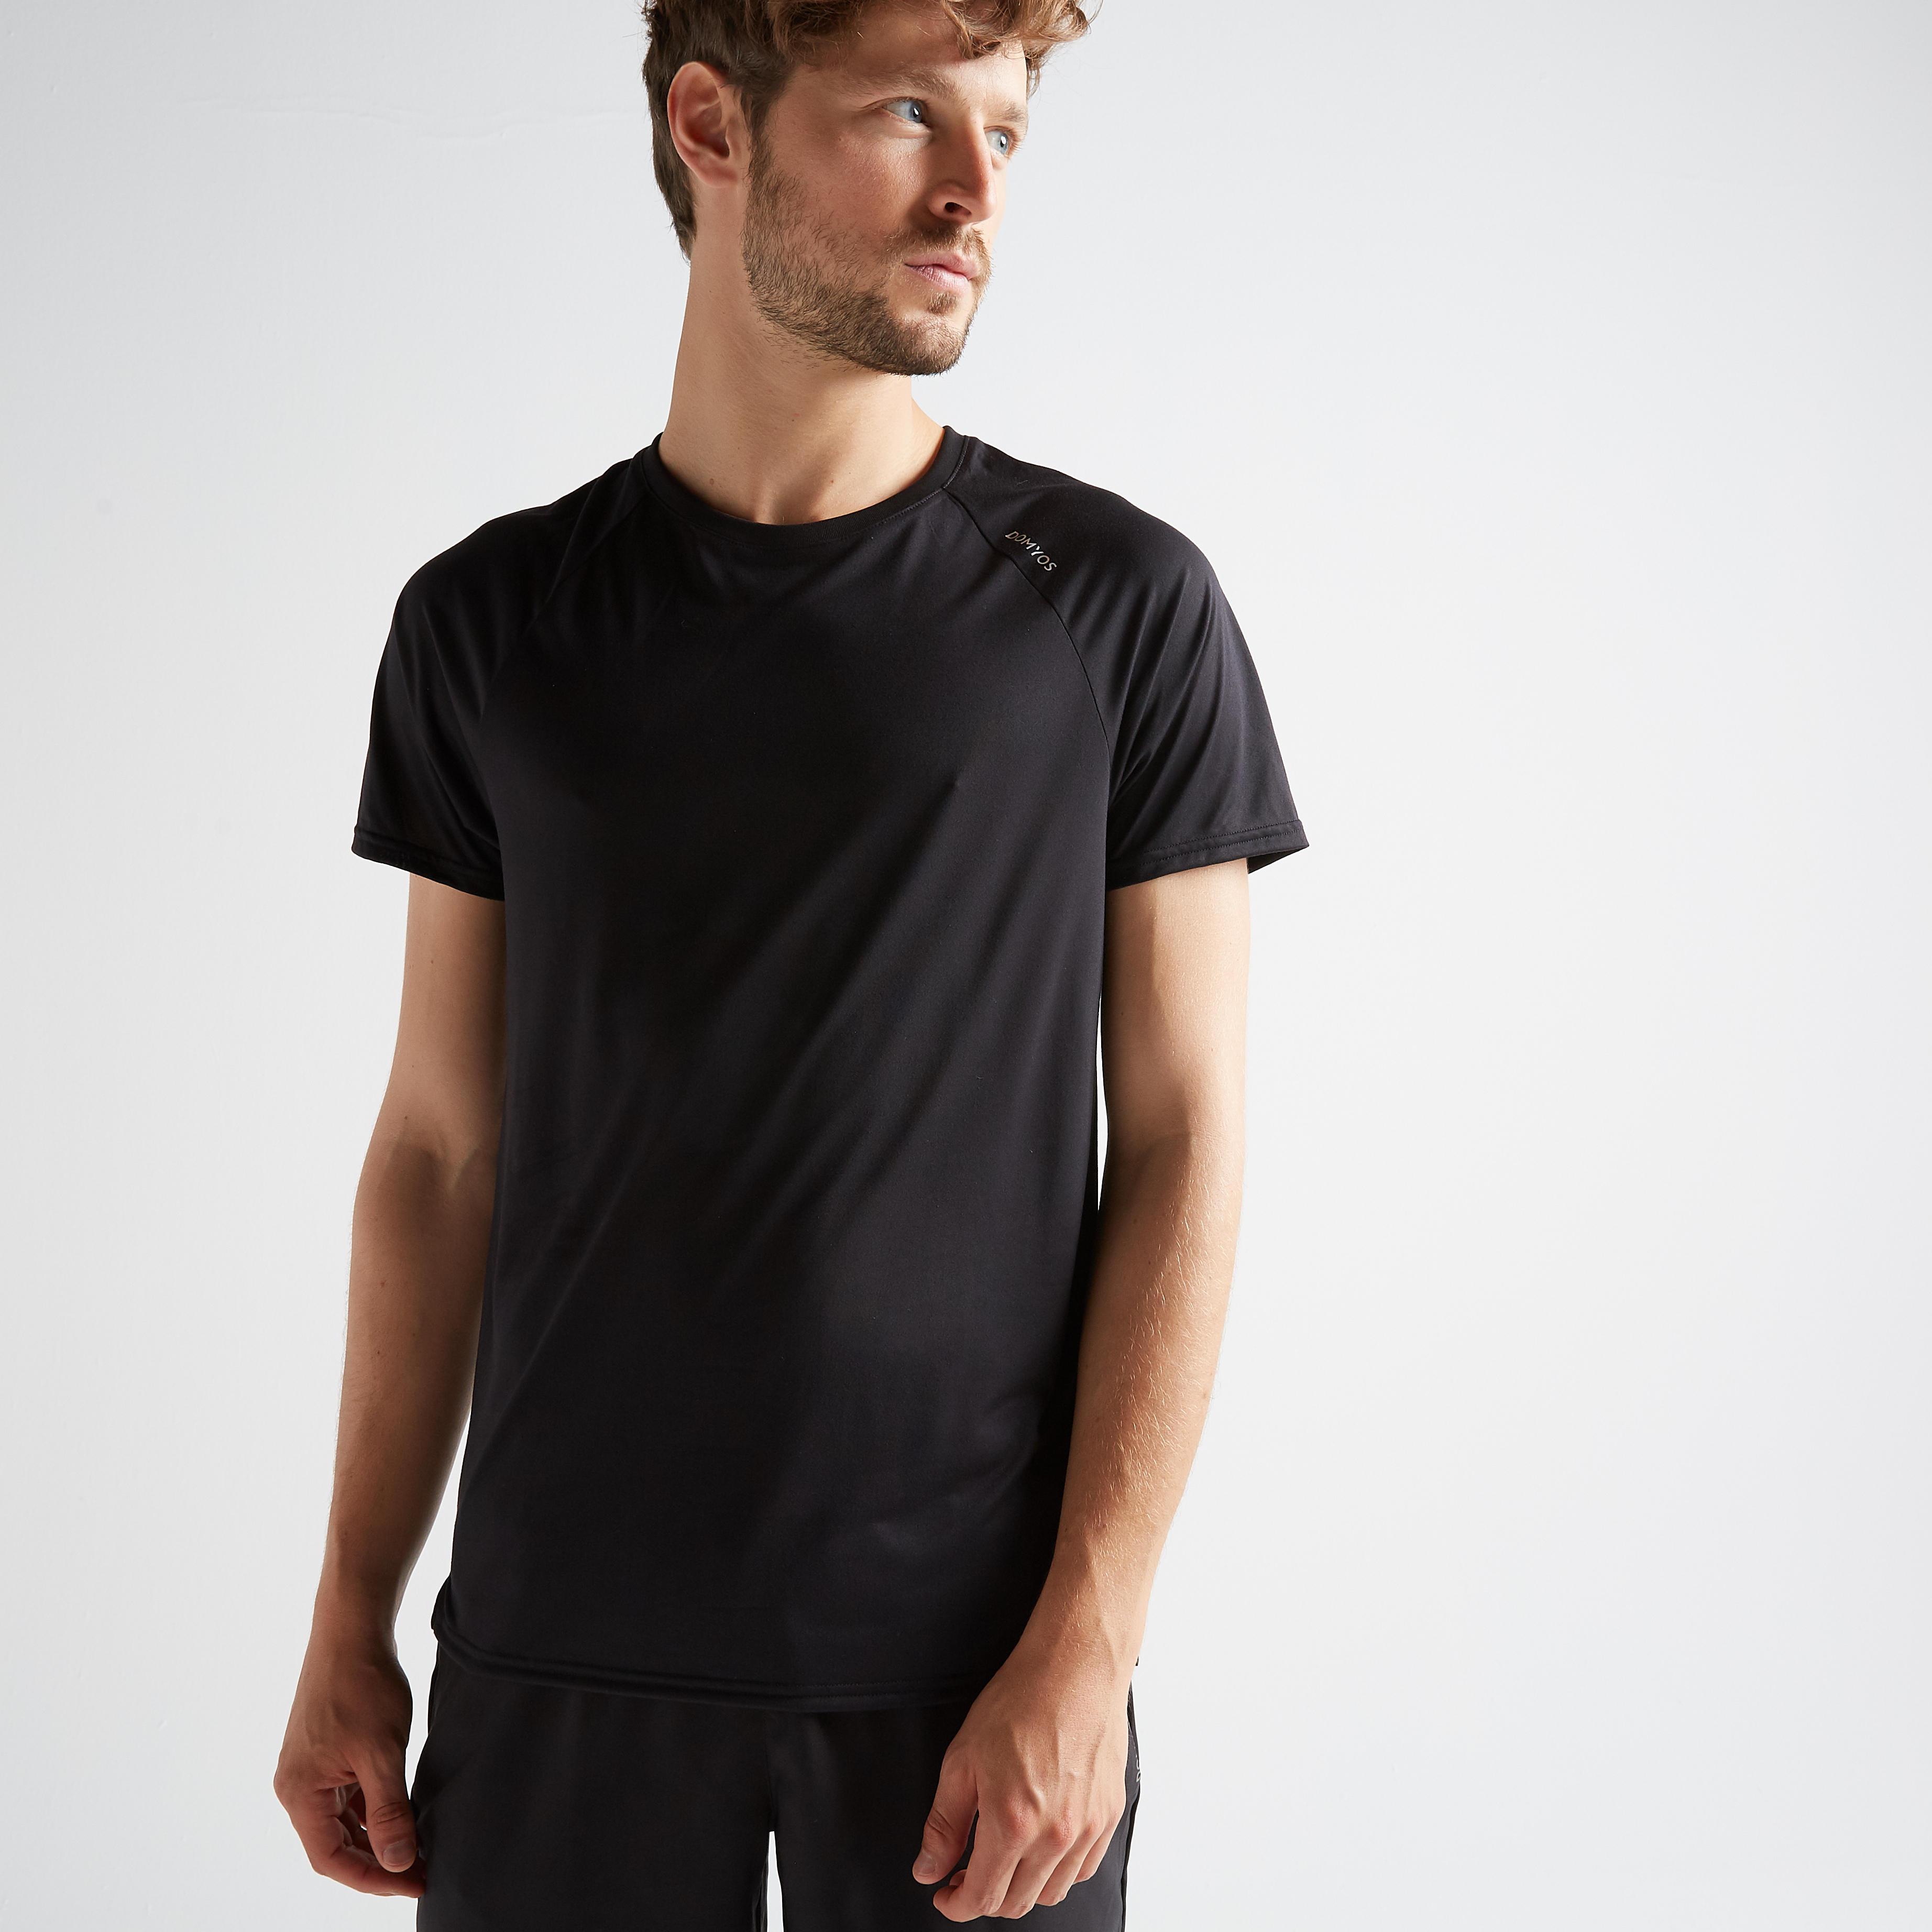 T-Shirt FTS 100 Fitness Cardio Herren   Sportbekleidung > Sportshirts > Poloshirts   Domyos